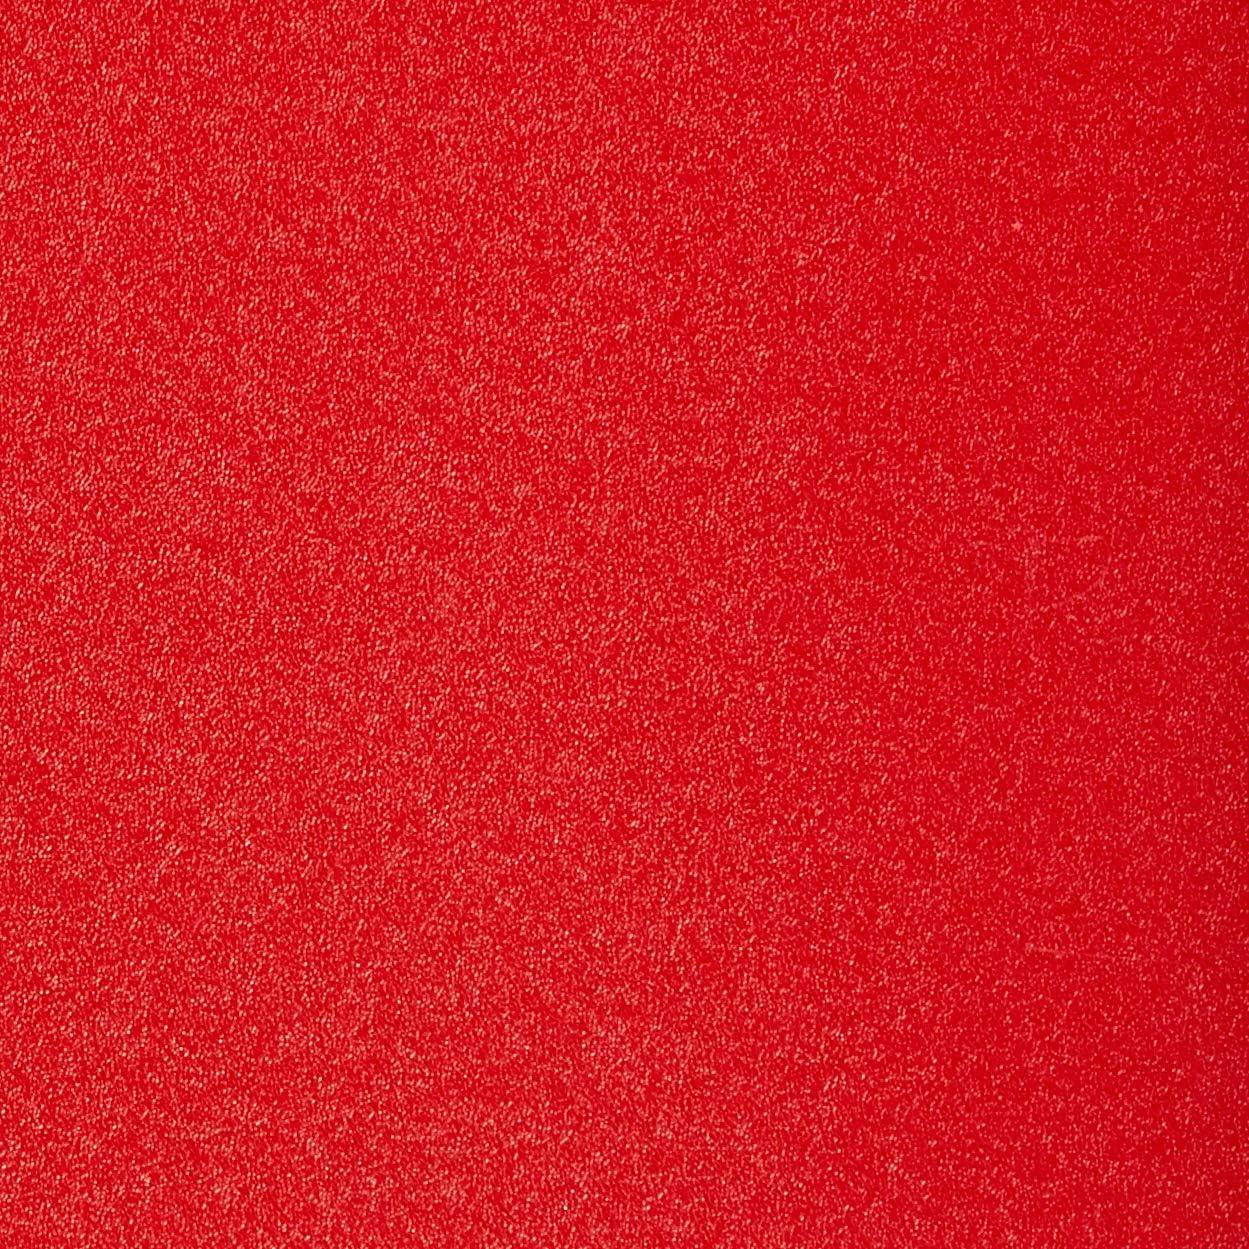 Rojo ModulHome 6RAN790BC Tablero DM, 25 x 22,8 x 3,4 cm Tablero//Madera DM 25 x 22,8 x 3,4 cm Estanter/ía para Colgar